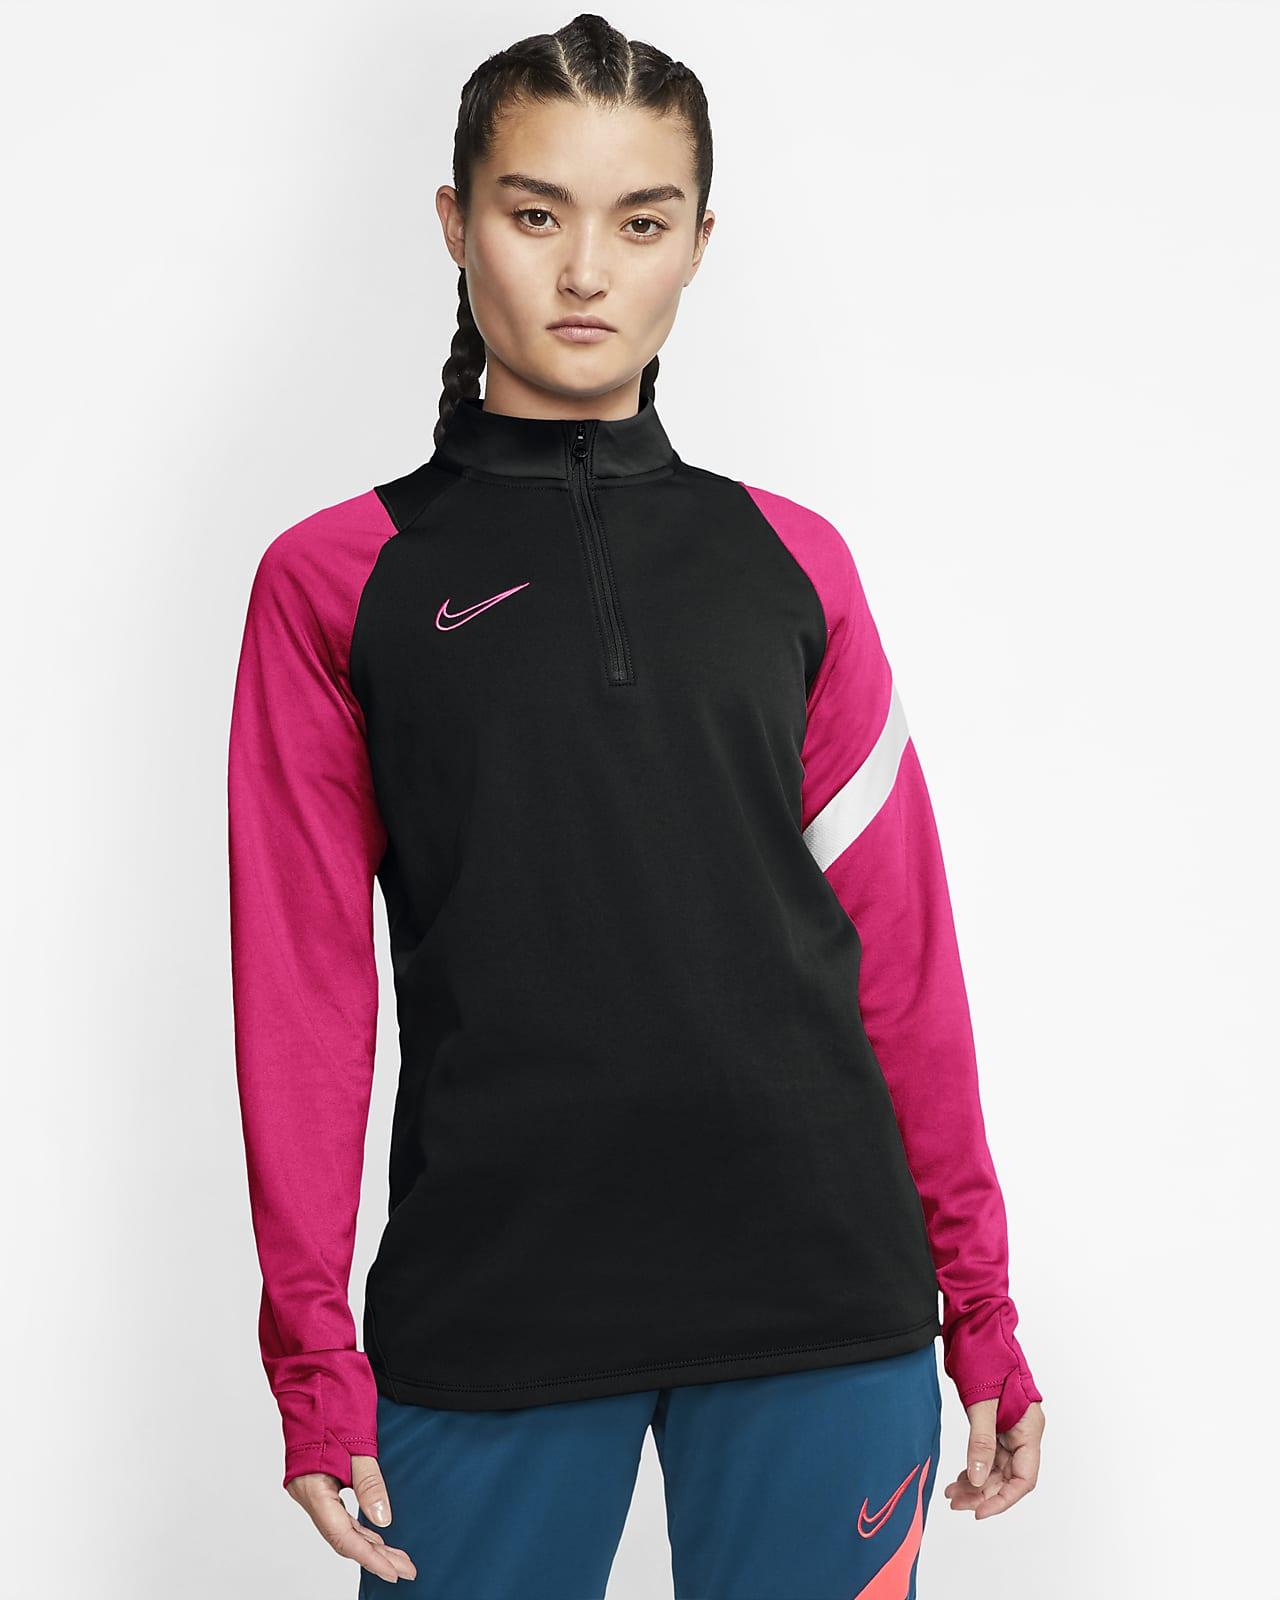 Nike Dri-FIT Academy Pro Women's Football Drill Top